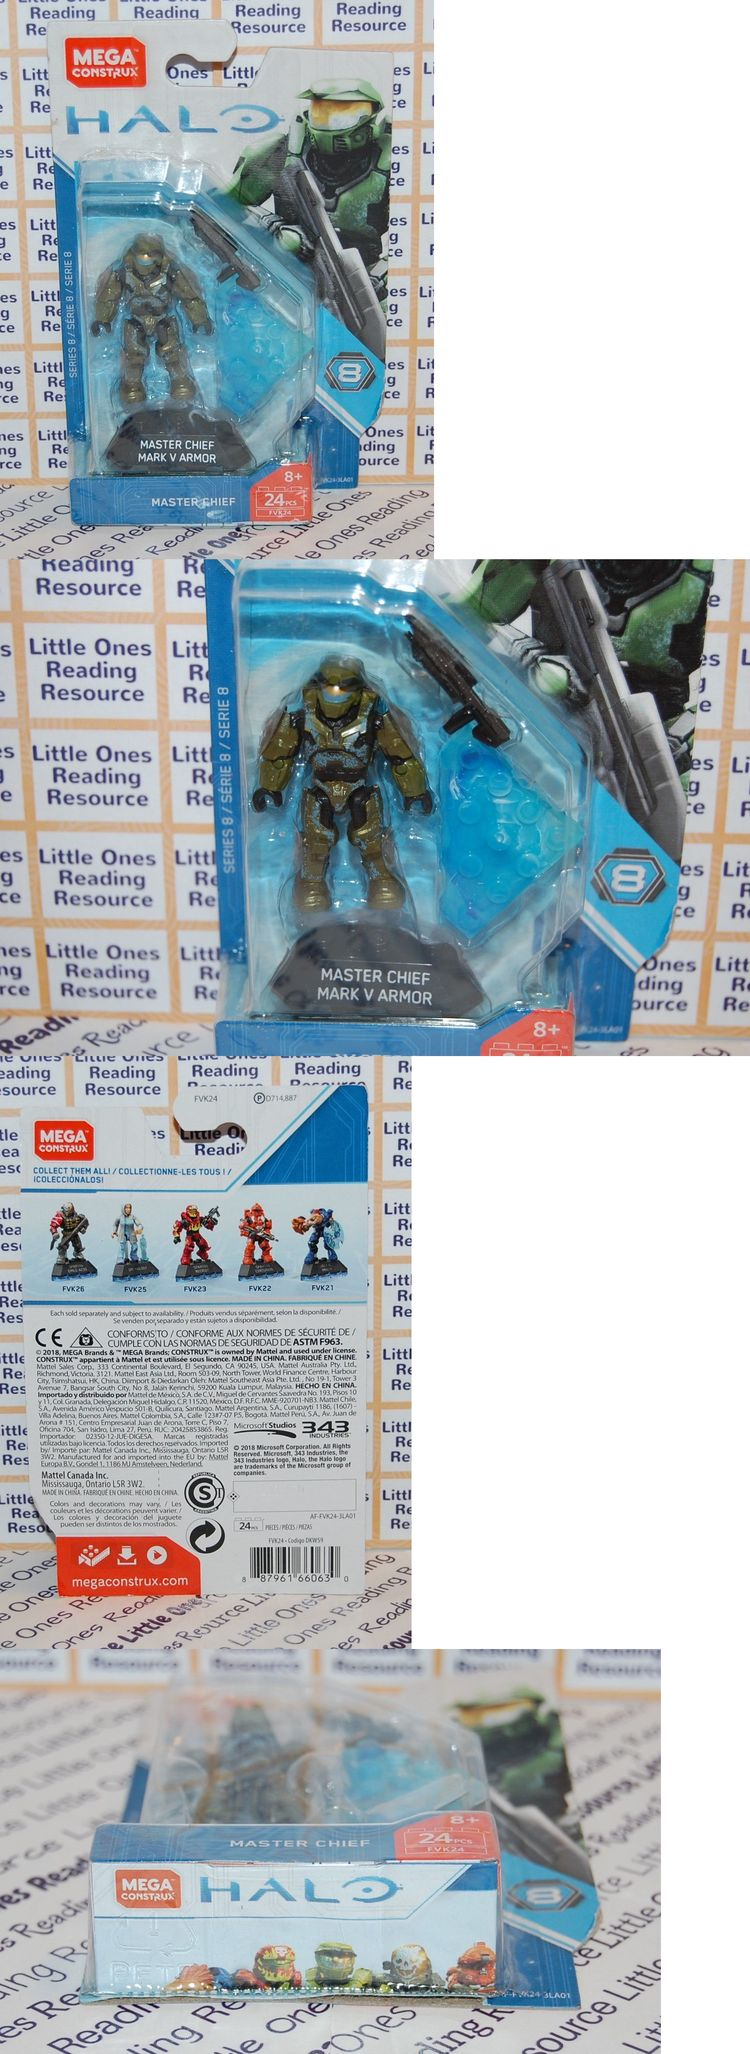 Mega Bloks Building Toys 52338: Master Chief Mark V Armor H